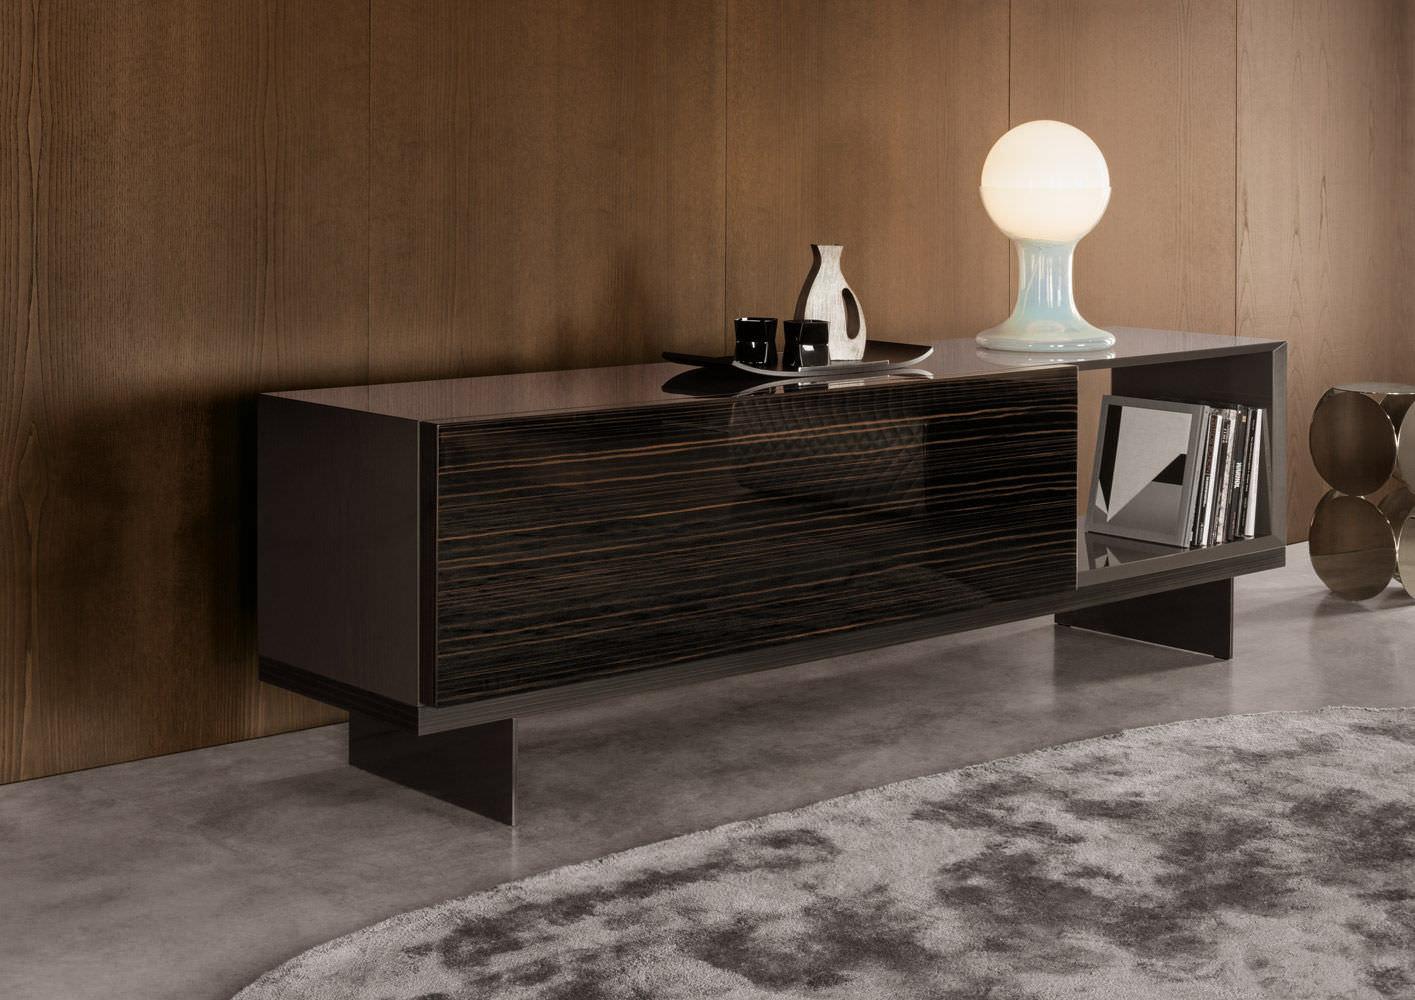 contemporary-sideboard-rodolfo-dordoni-11241-7259351.jpg